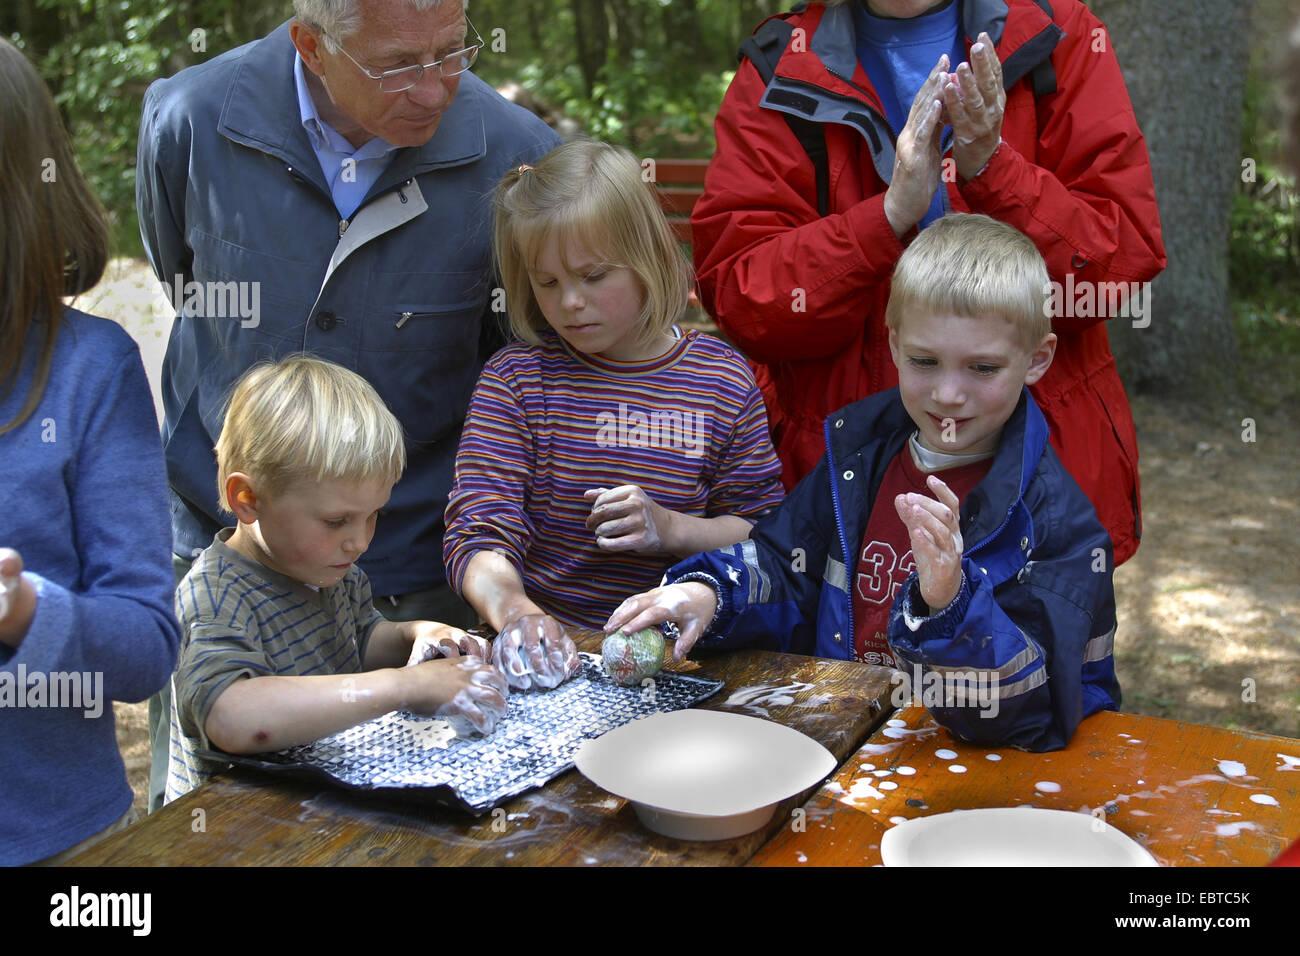 children felting sheep wool, Germany - Stock Image